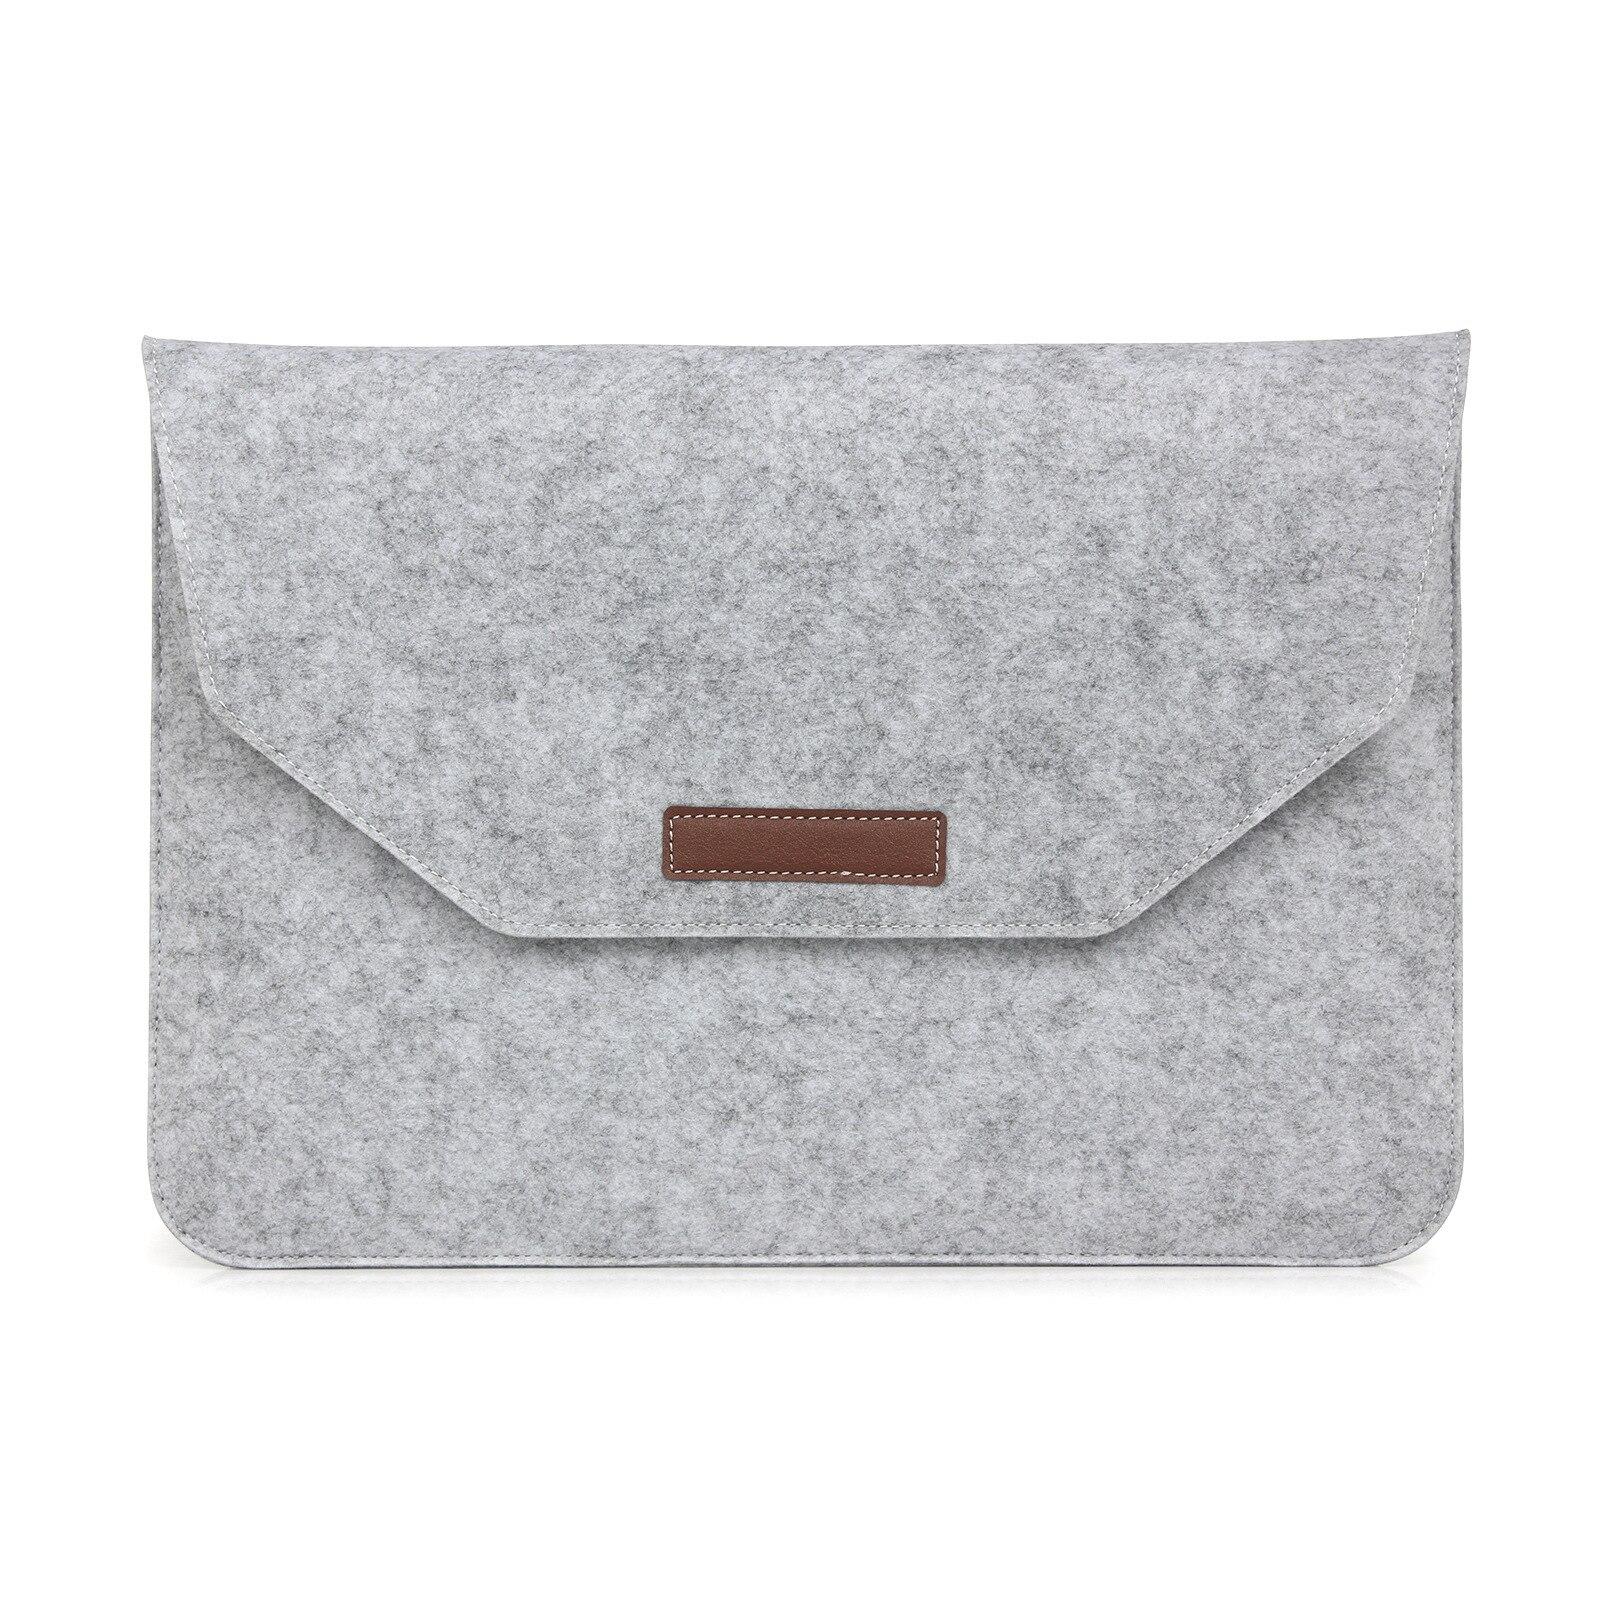 MacBook/iPad Gift Flat Sleeve Protective Case for Felt Apple Notebook Computer Bag